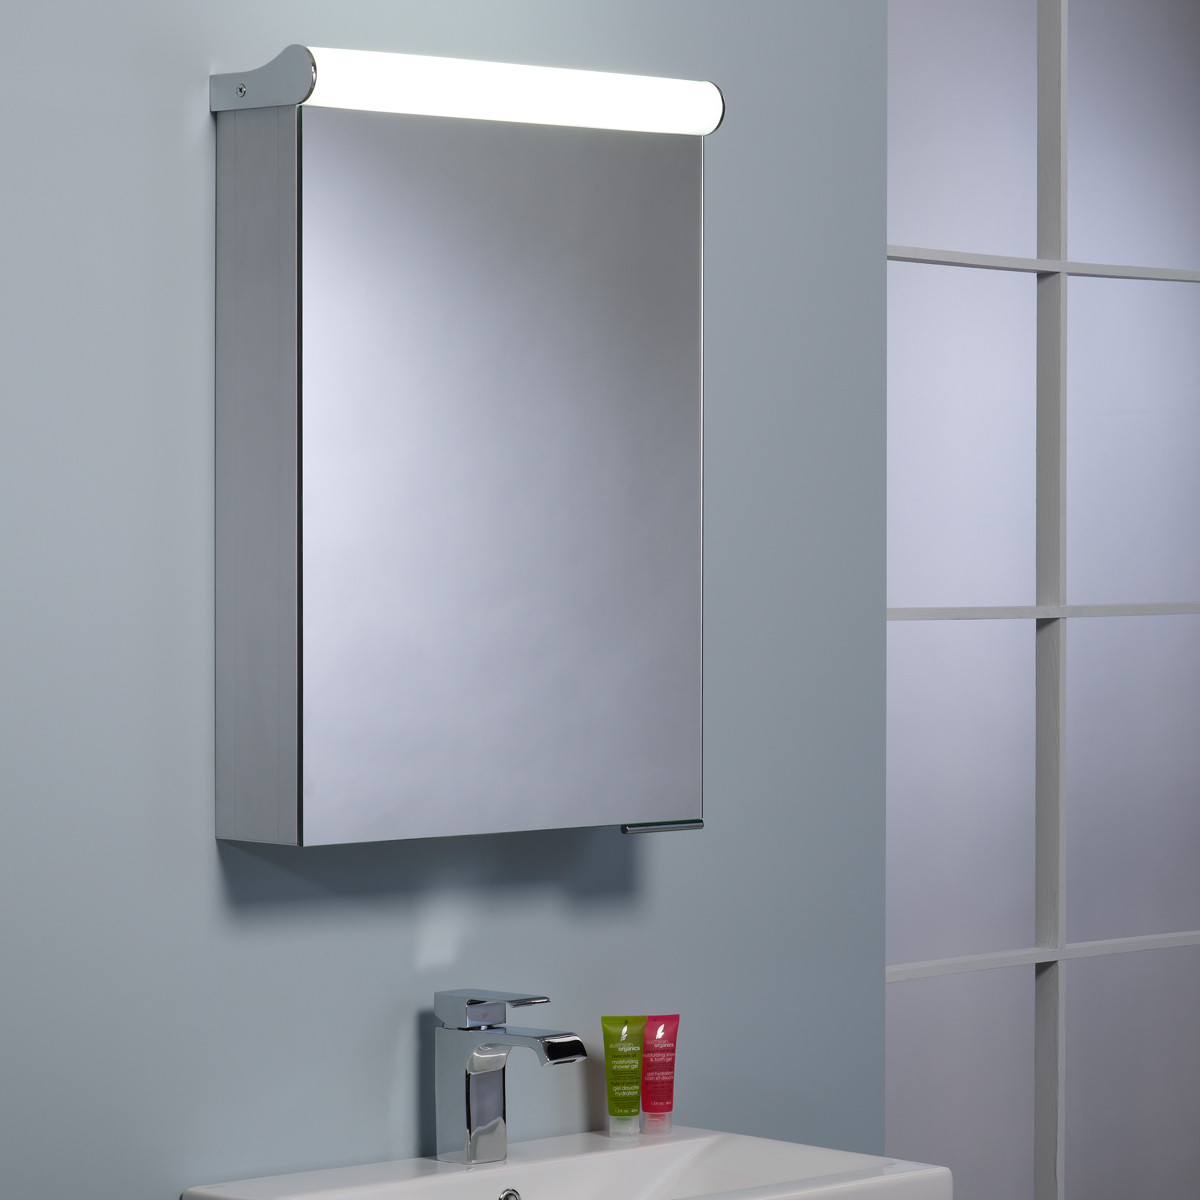 roper rhodes elevate bathroom cabinet